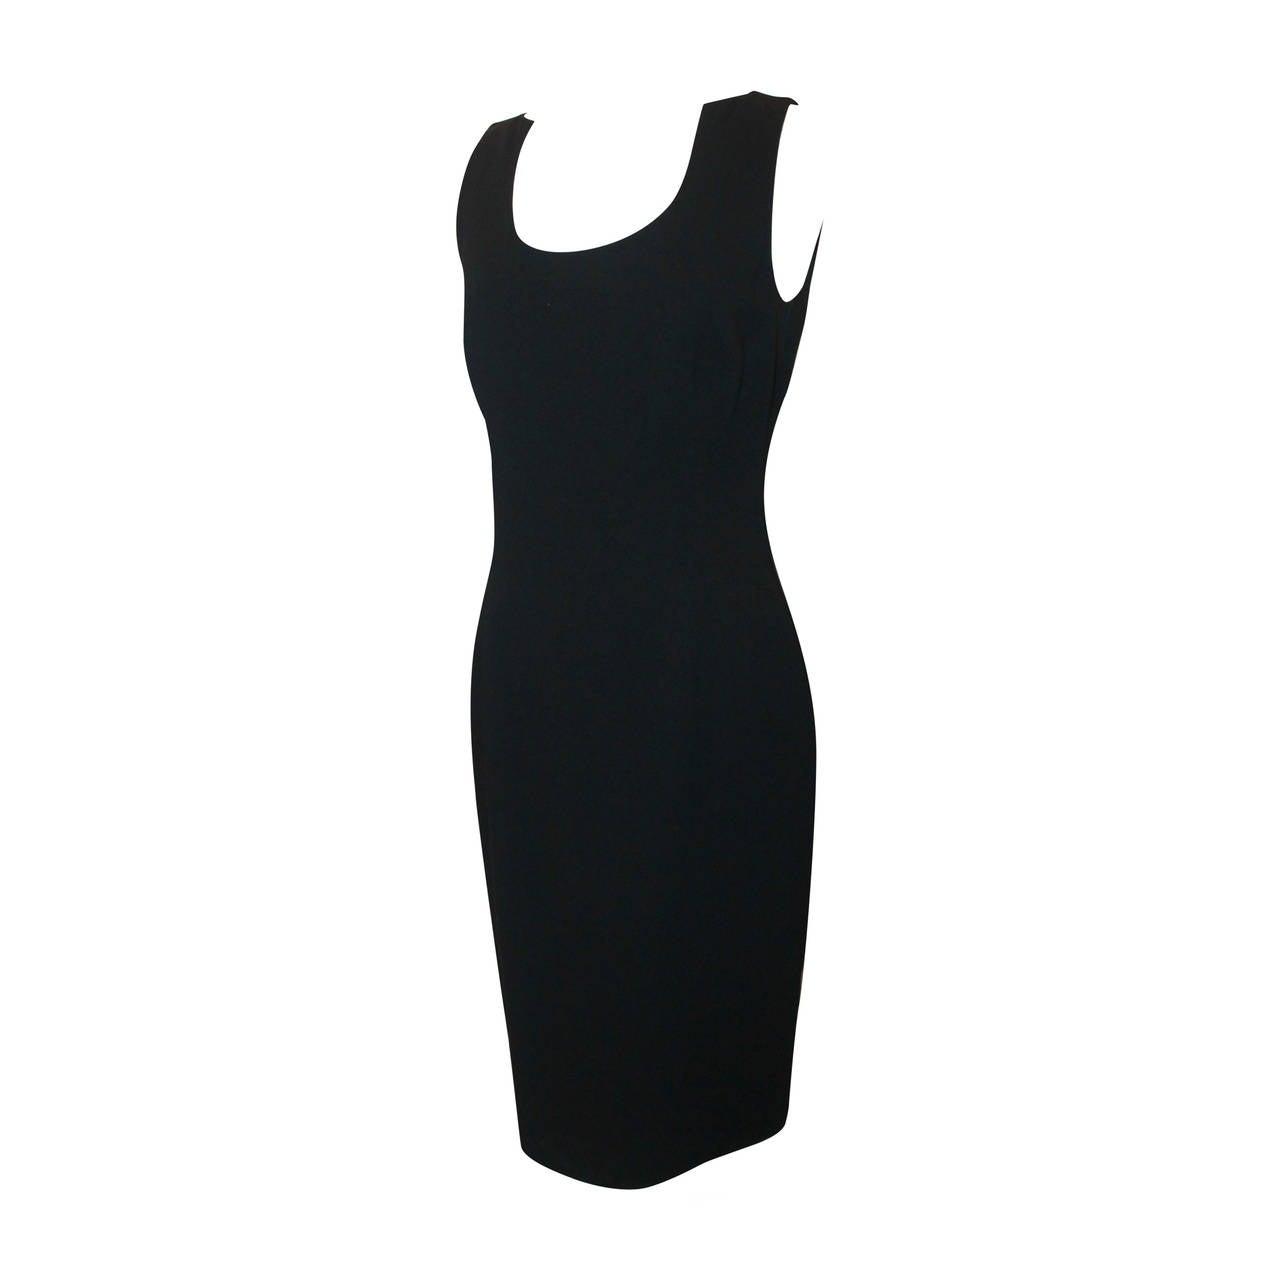 Chado Black Wool Tapered Dress  - 8